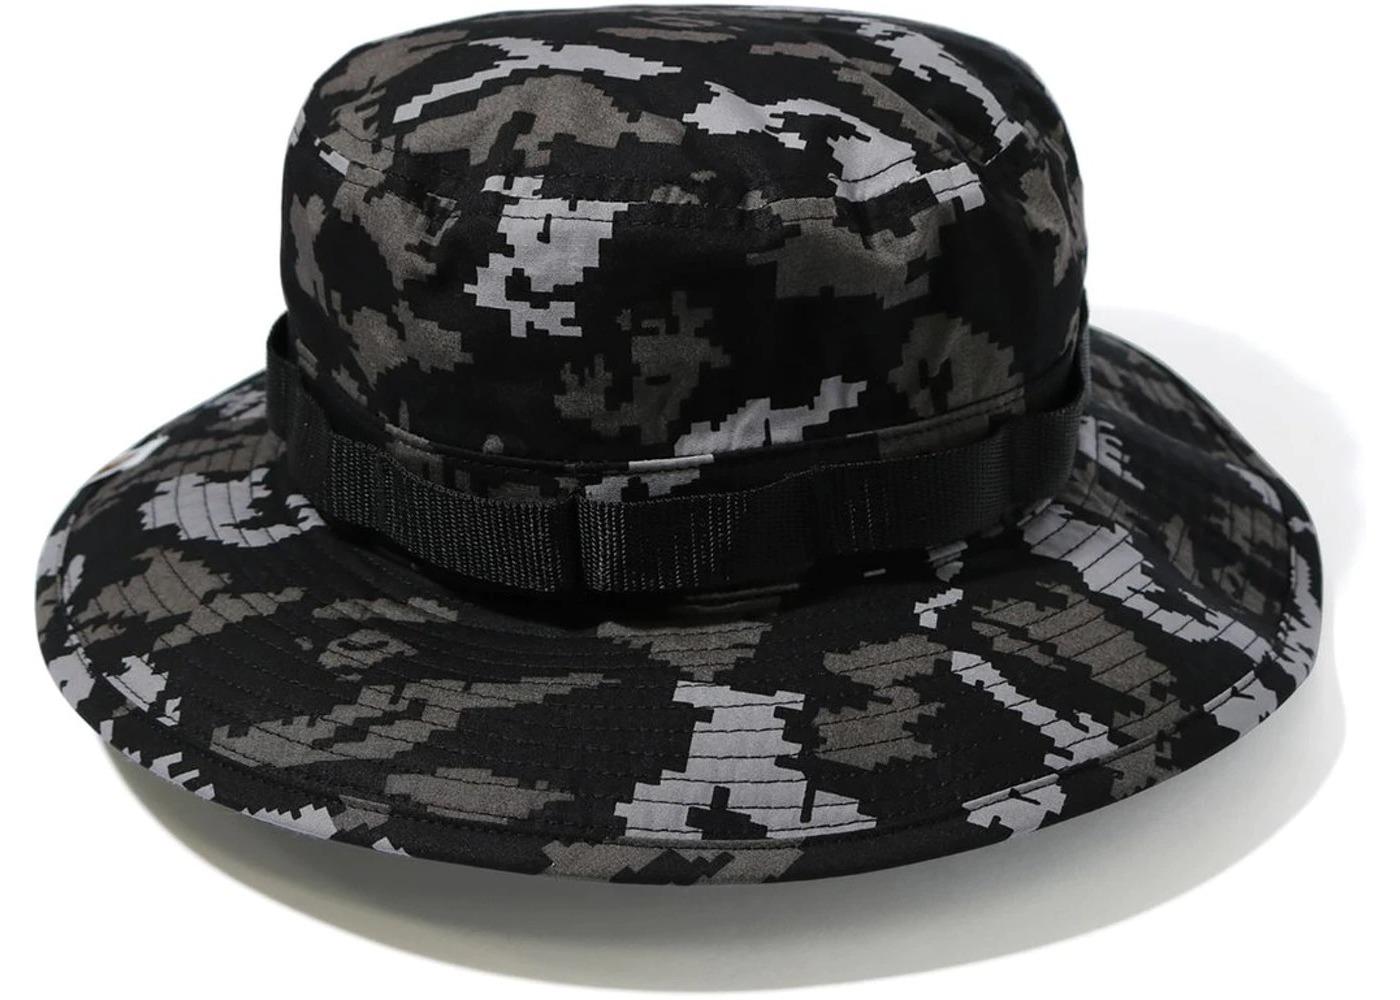 Bape Digital Camo Military Hat Black (FW20)の写真